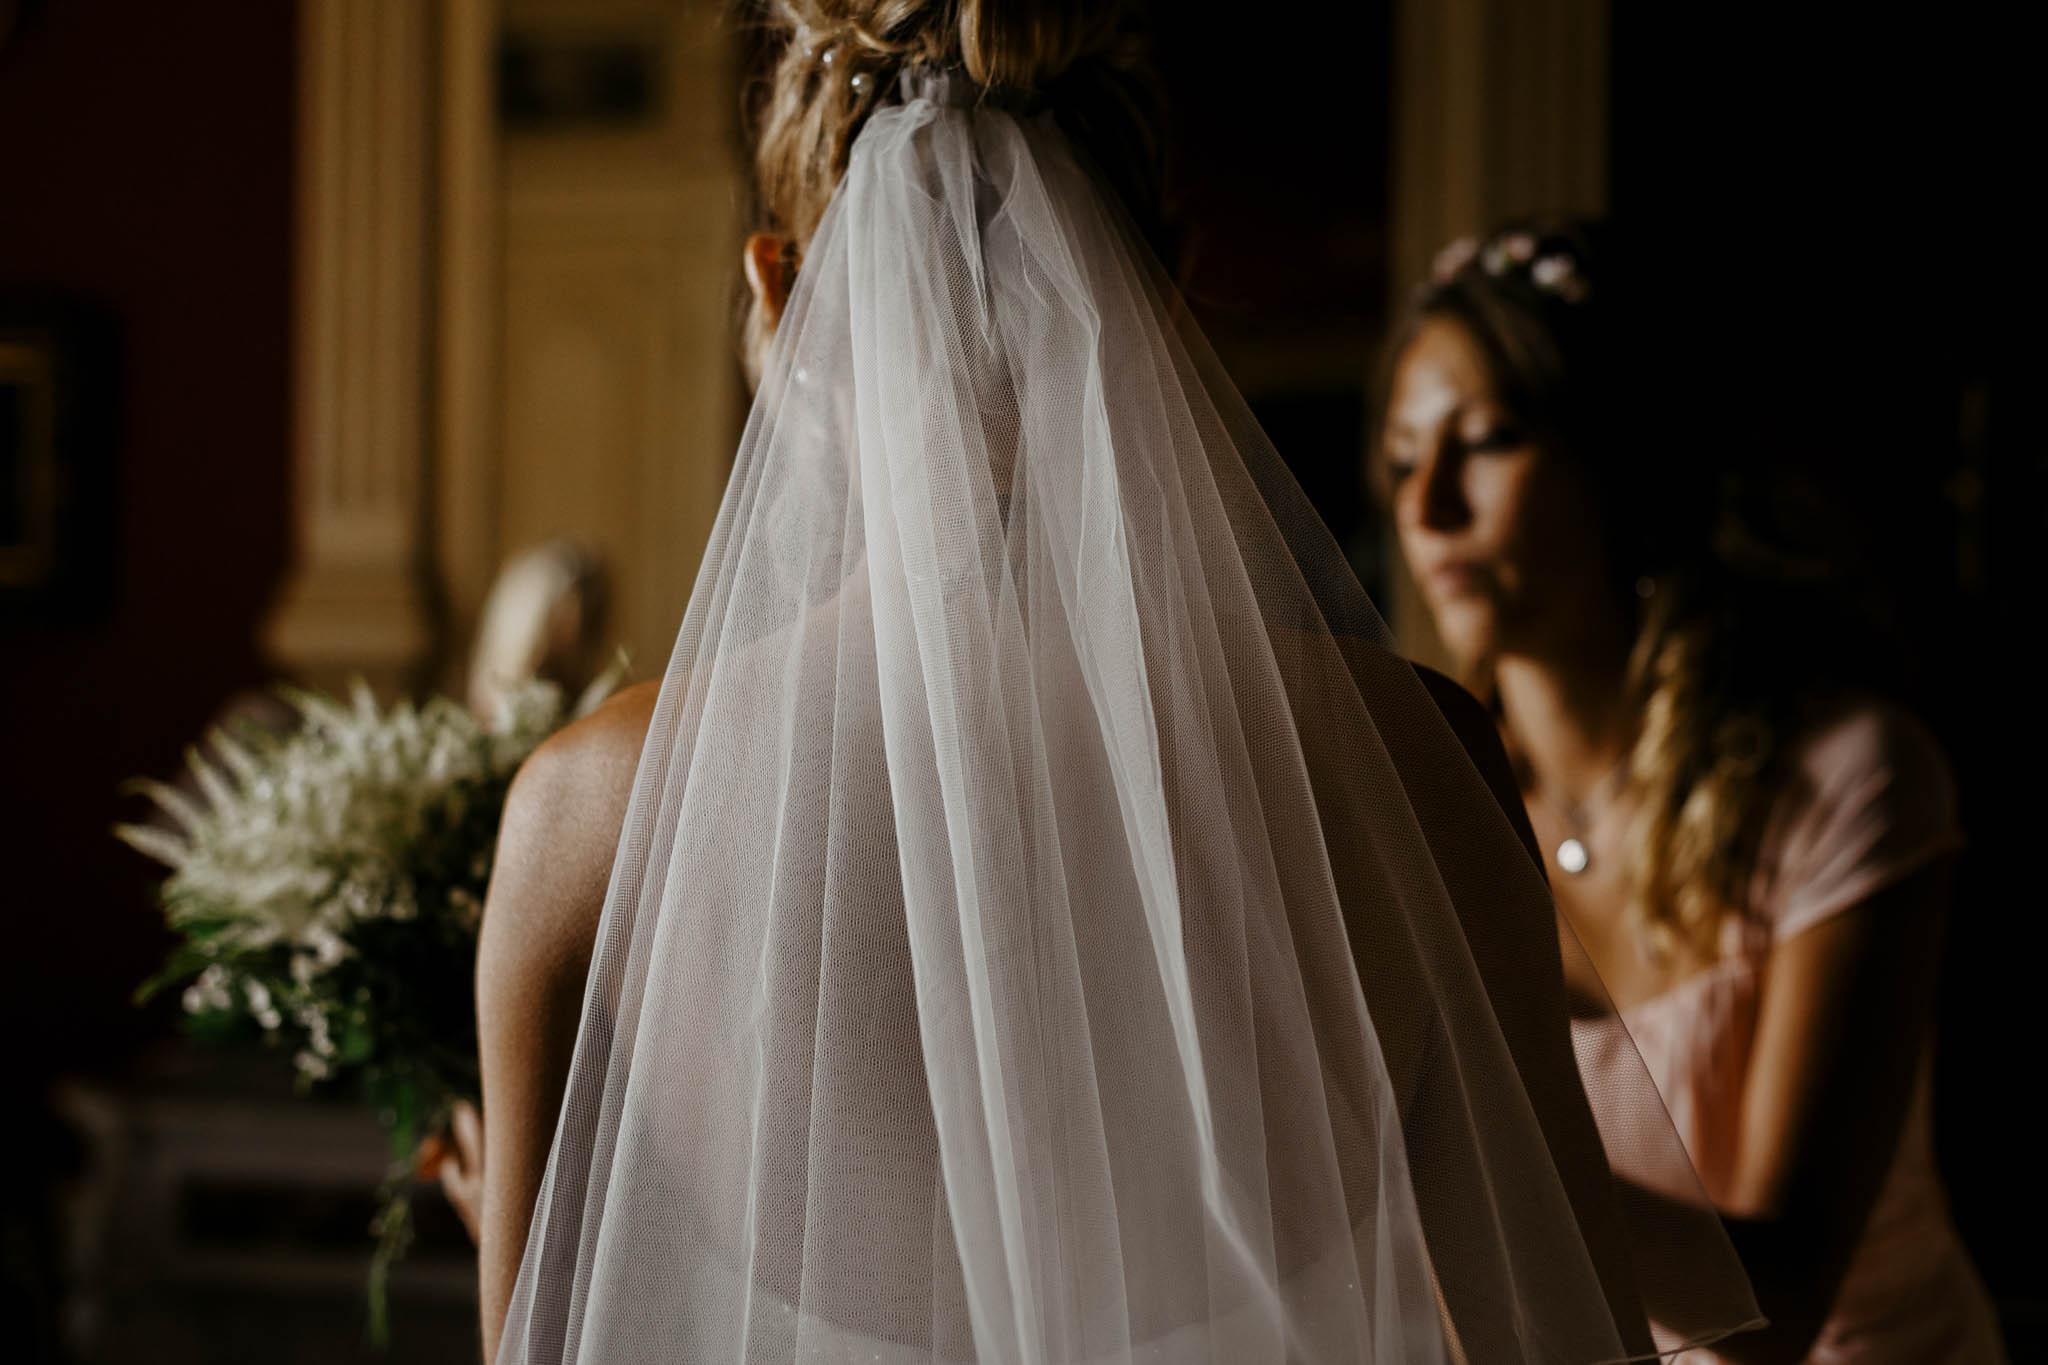 mariage-chateau-gaudras-ingold-59.jpg